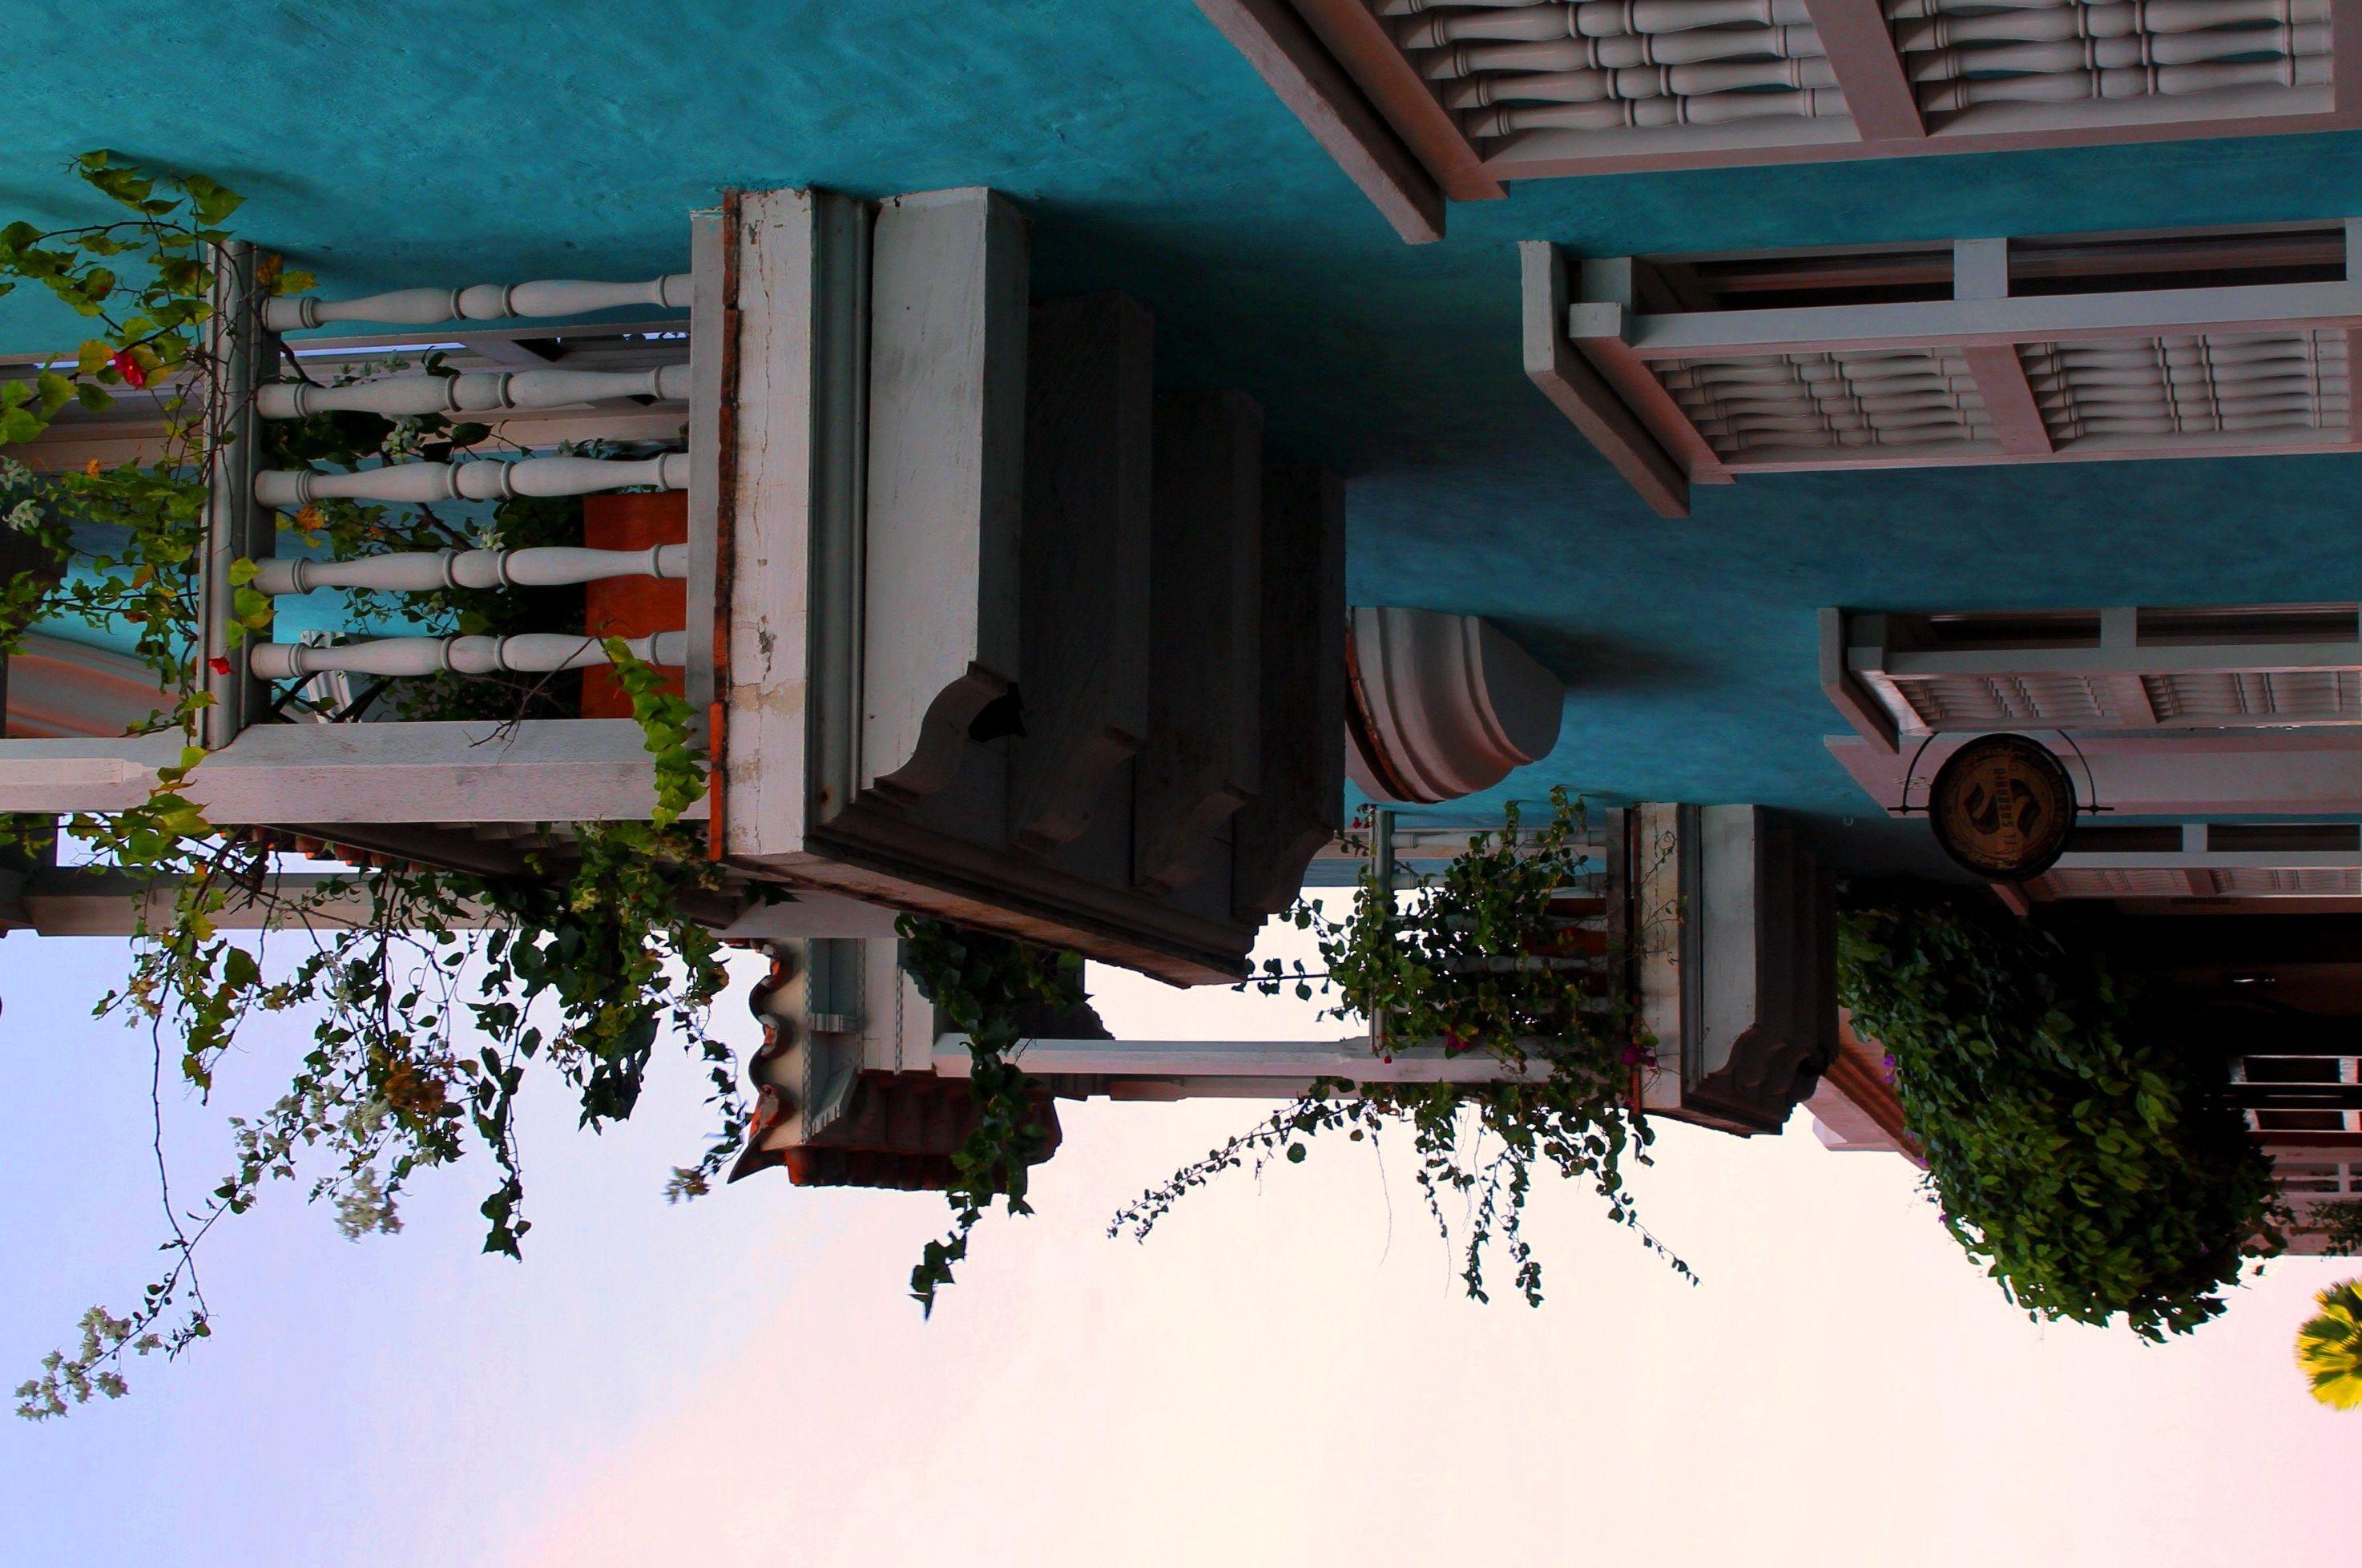 Cartagena, Bolívar - Colombia